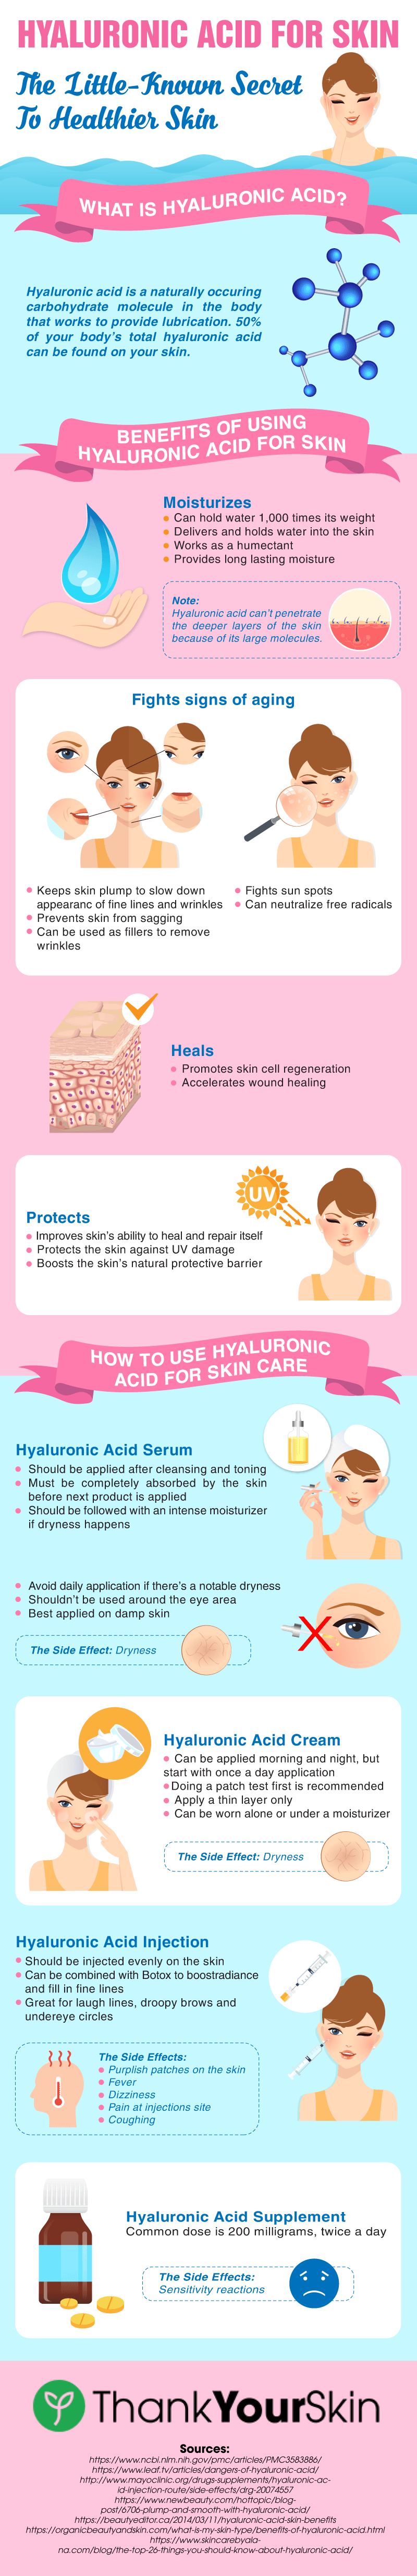 Hyaluronic Acid For Skin: The Little-Known Secret To Healthier Skin